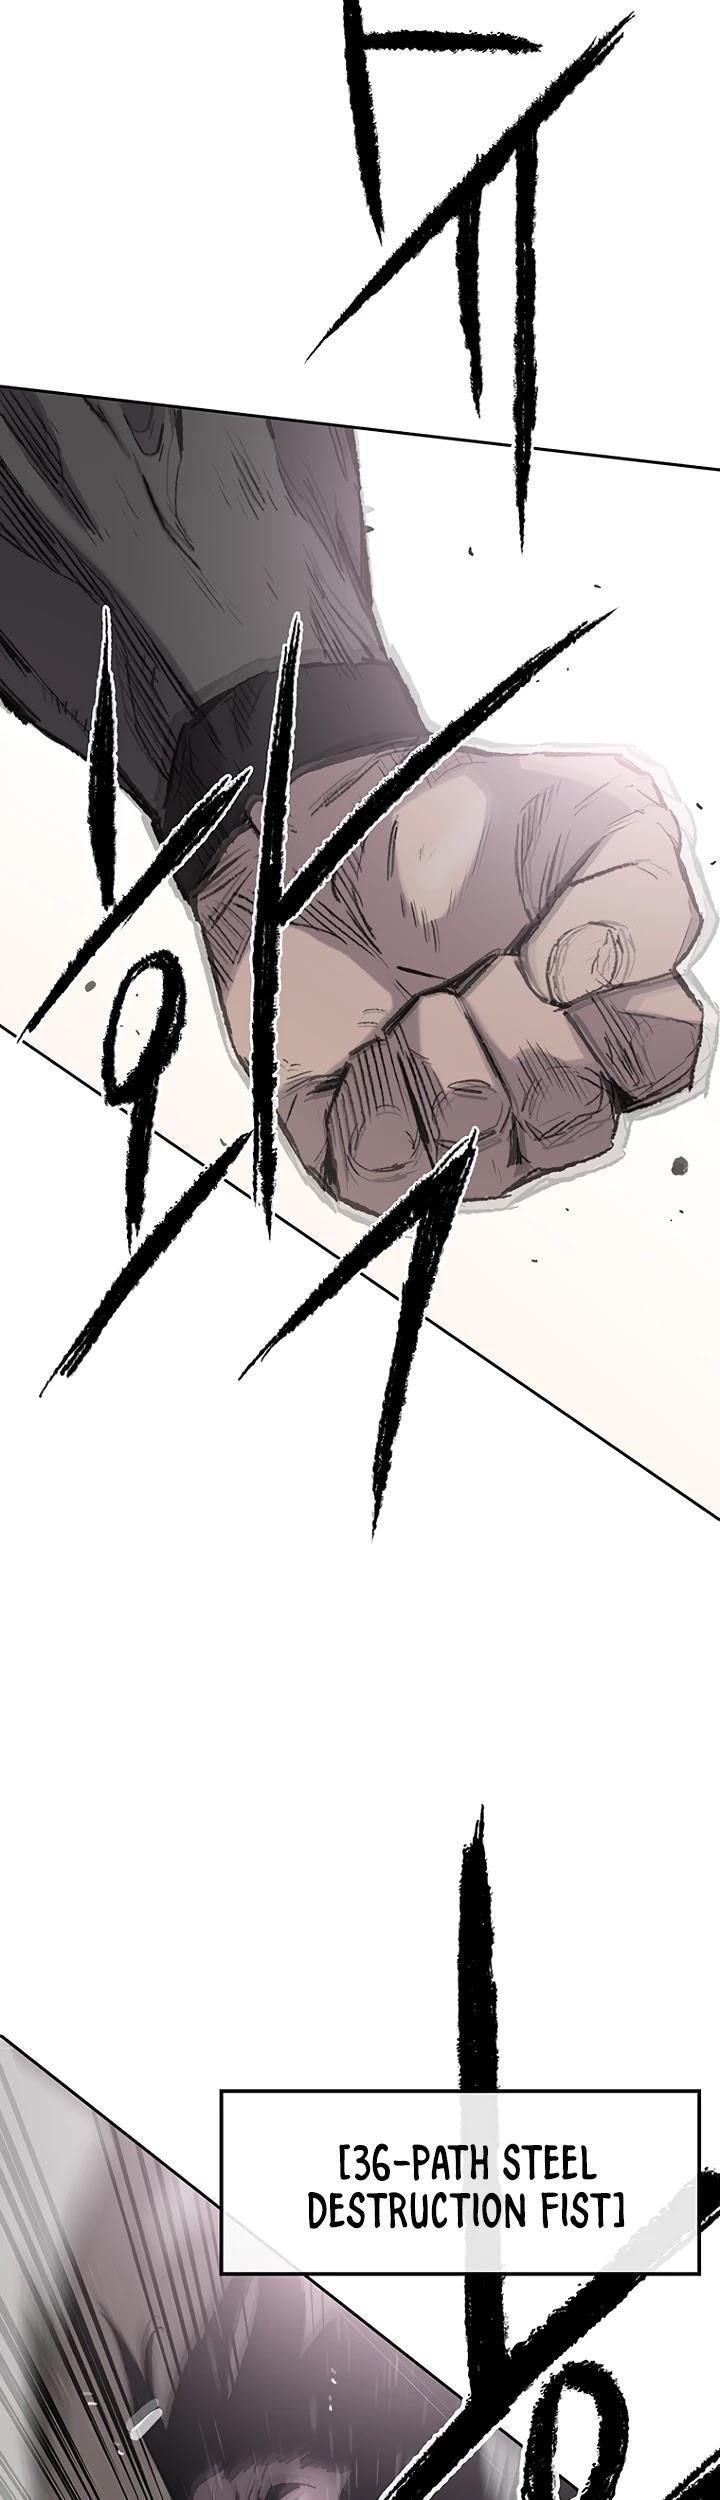 The Undefeatable Swordsman Chapter 73 page 16 - Mangakakalots.com